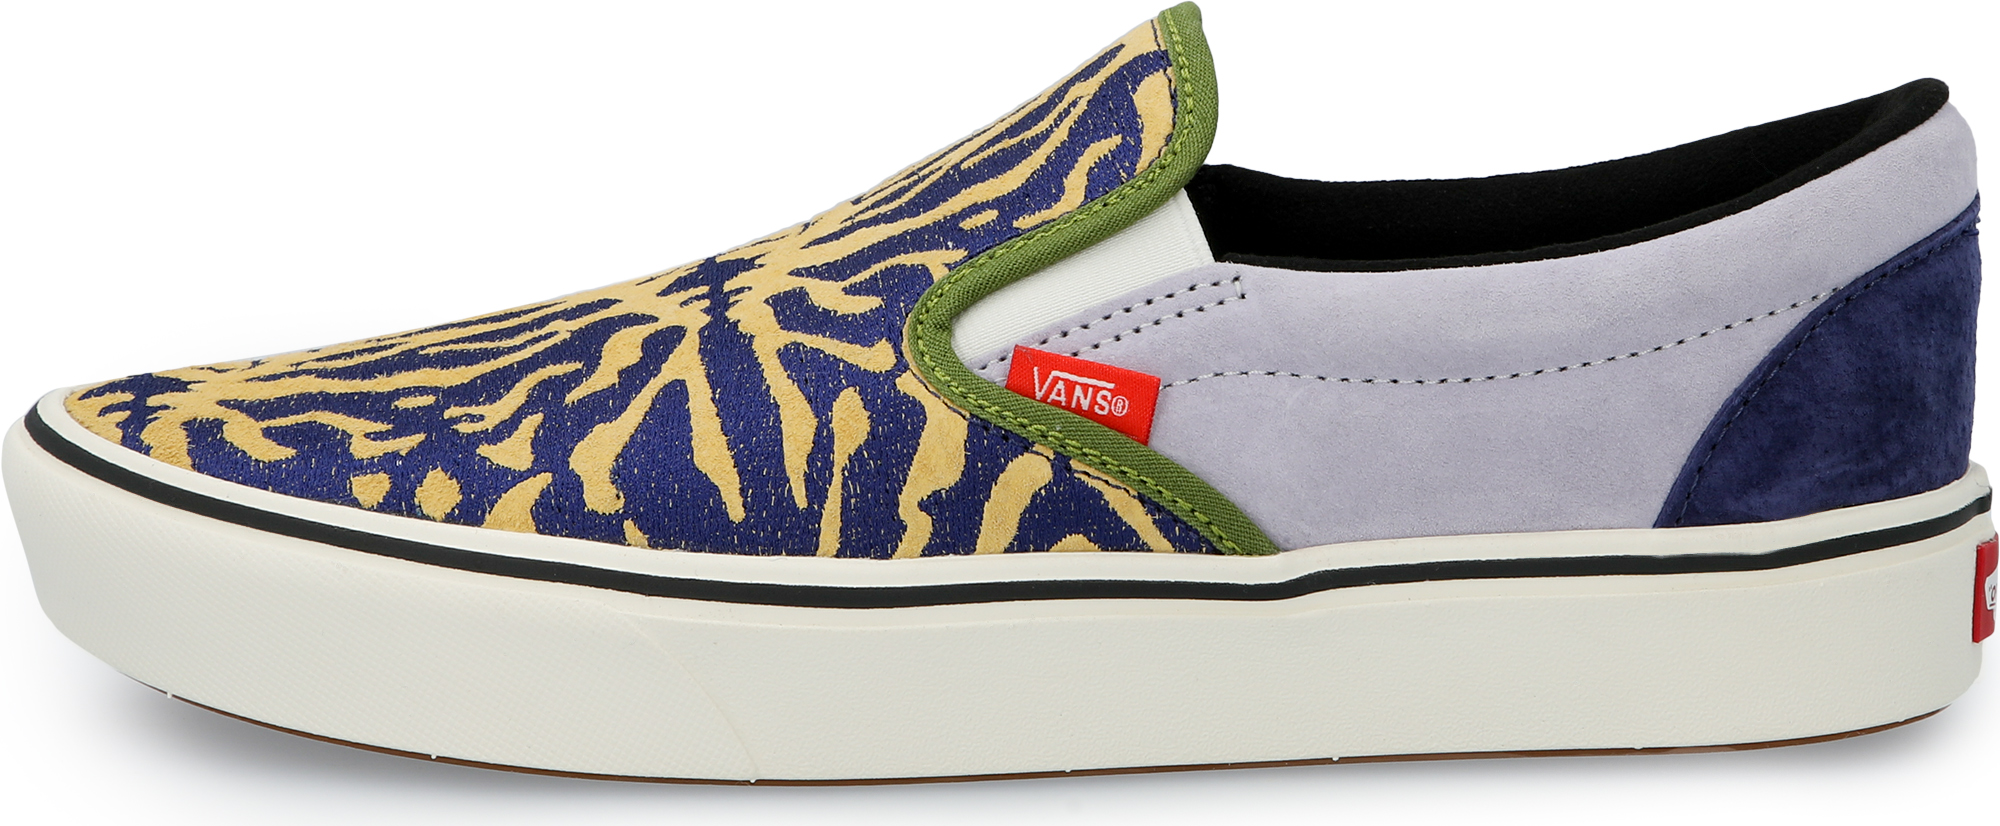 Vans Кеды женские Vans ComfyCush Slip-On, размер 40 кеды vans vans va984auajyf8